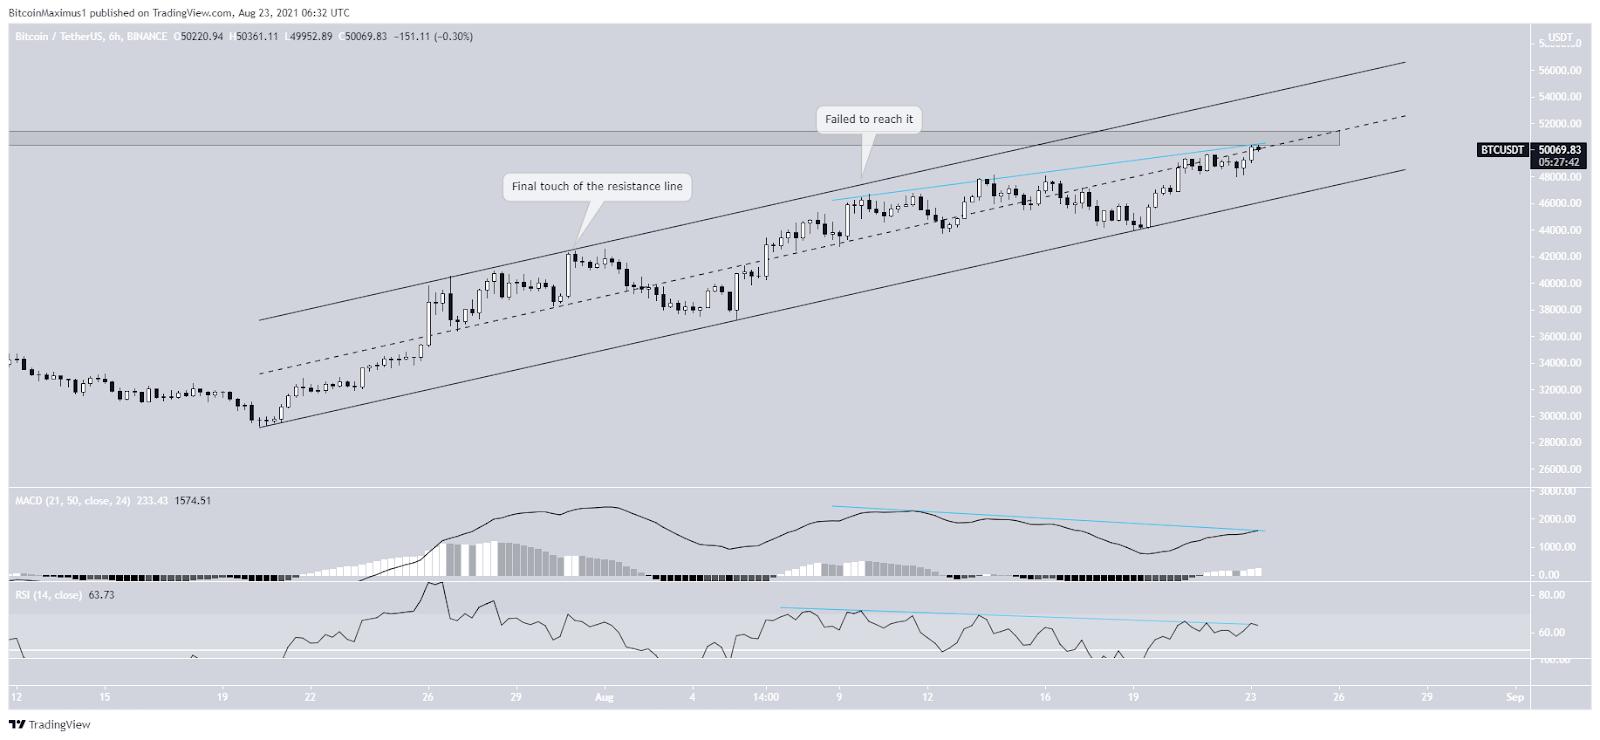 Bitcoin Preis Kurs Chart 2 23.08.2021